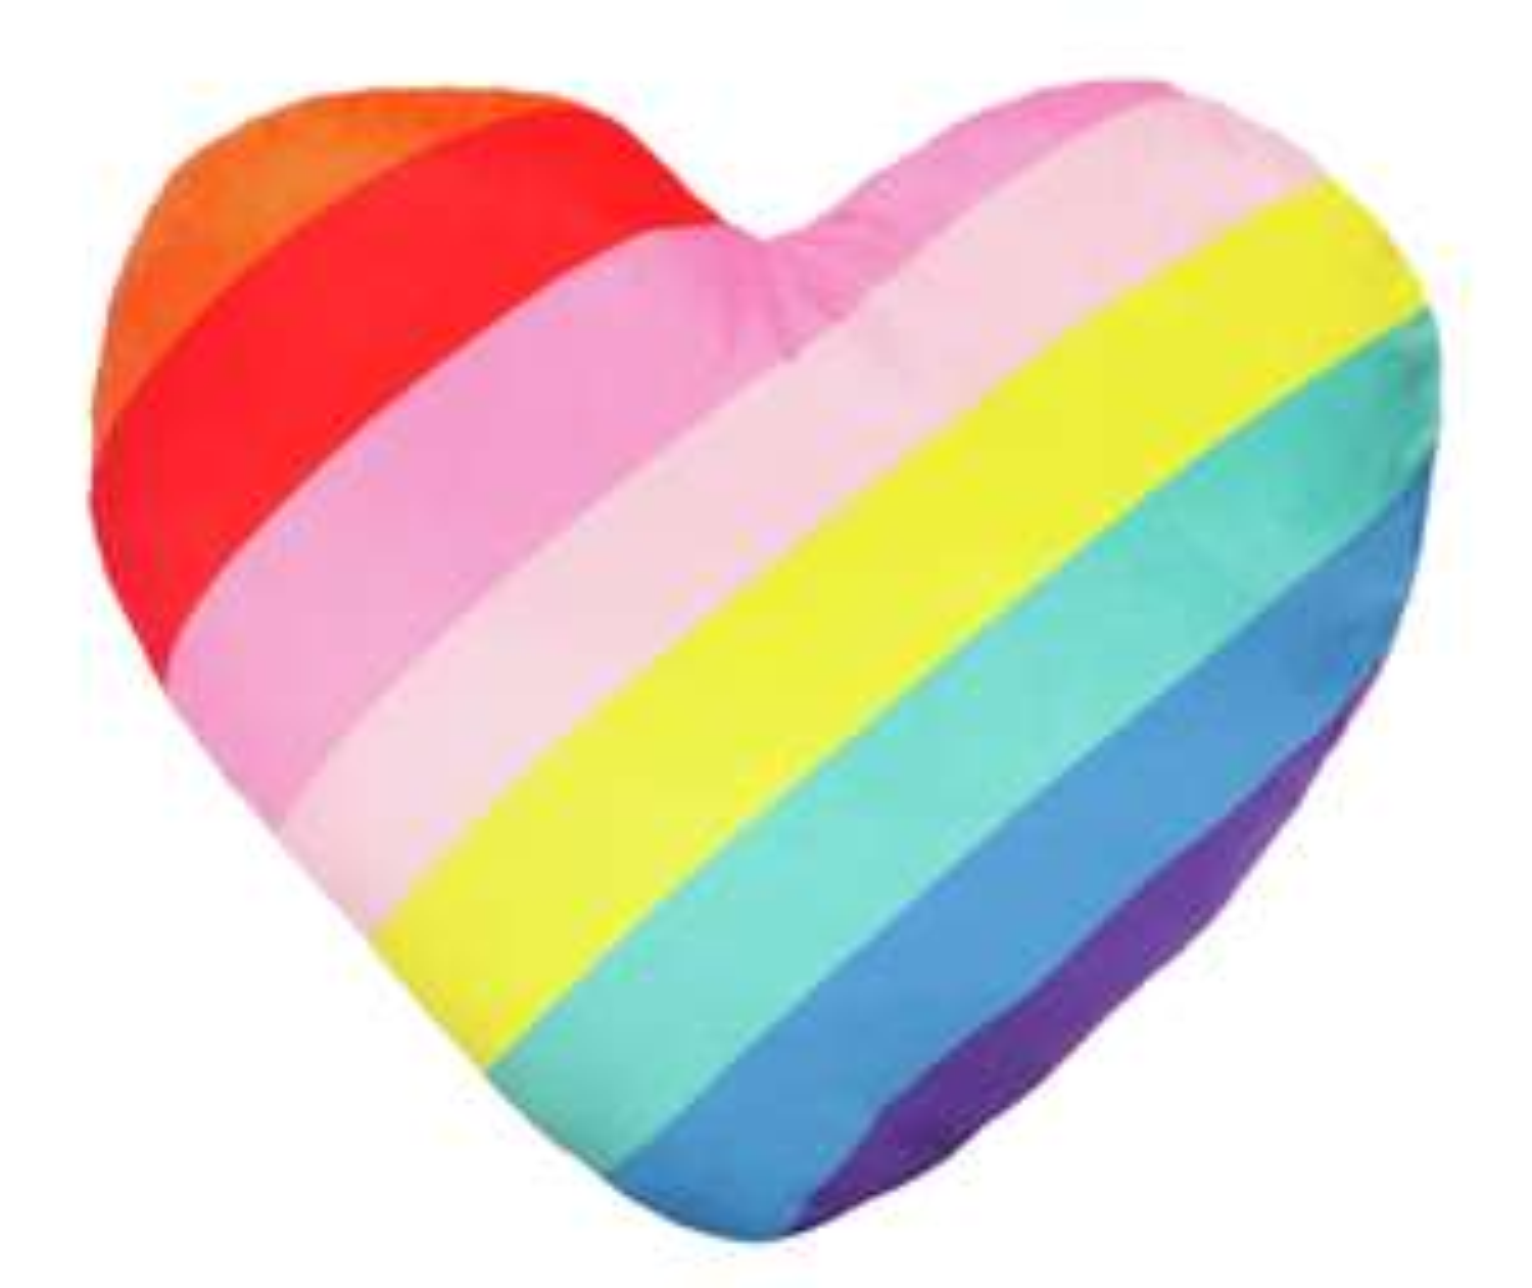 Heart Shaped Mallow Cushion for £3 @ Argos